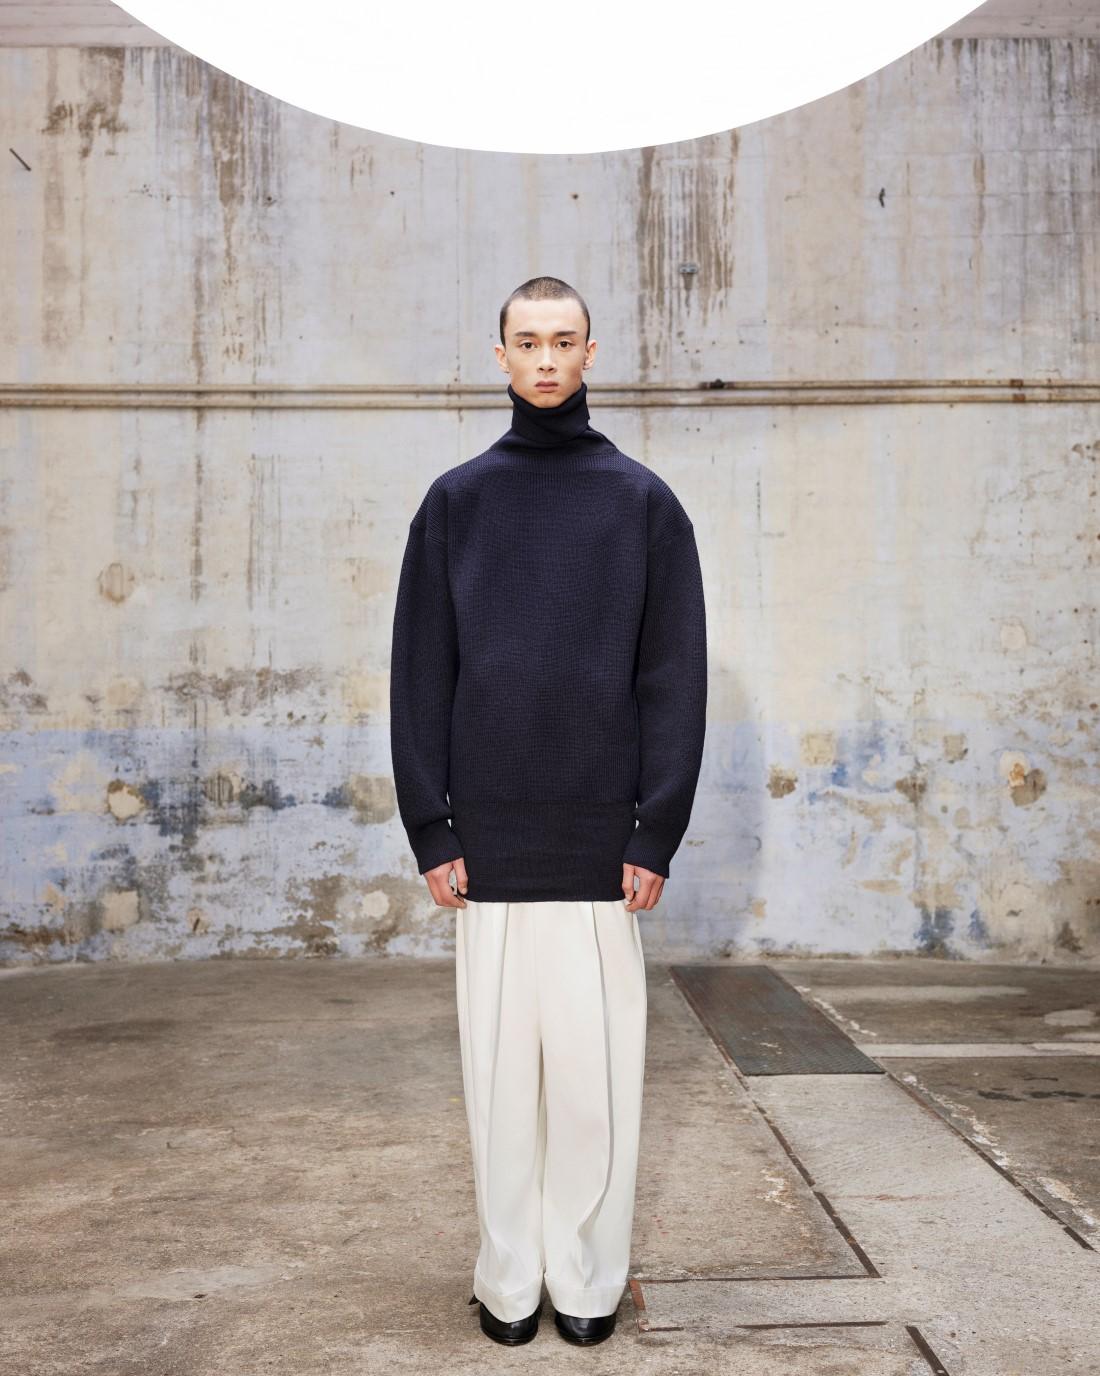 Hed Mayner - Automne-Hiver 2021 - Paris Fashion Week